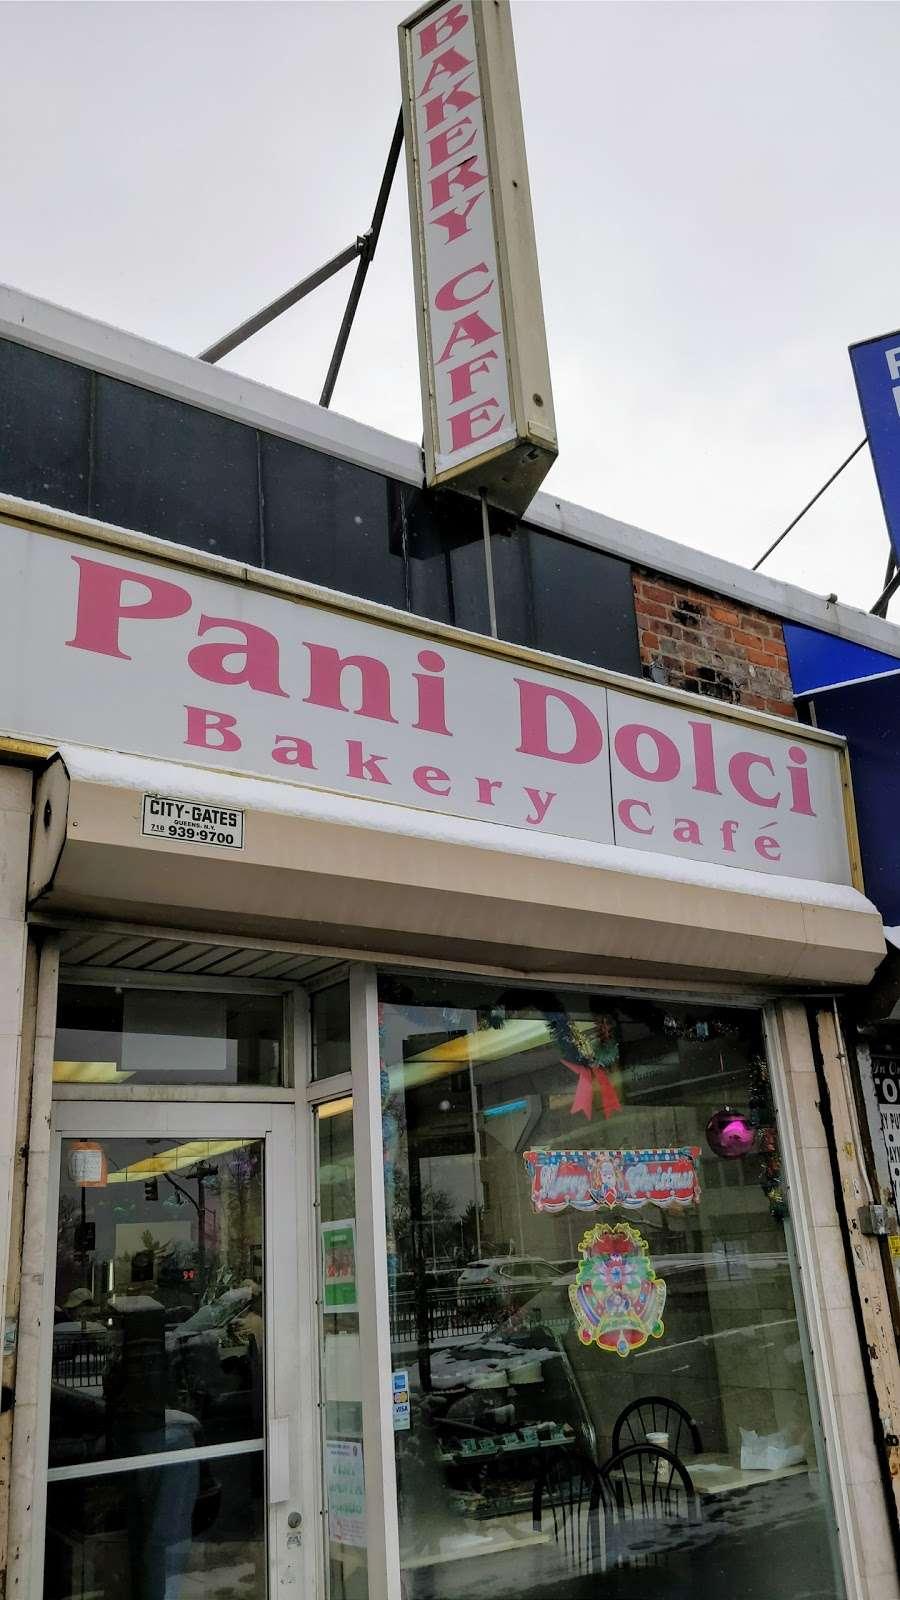 Pani Dolci - bakery  | Photo 5 of 6 | Address: 13767 Queens Blvd, Jamaica, NY 11435, USA | Phone: (718) 526-4407